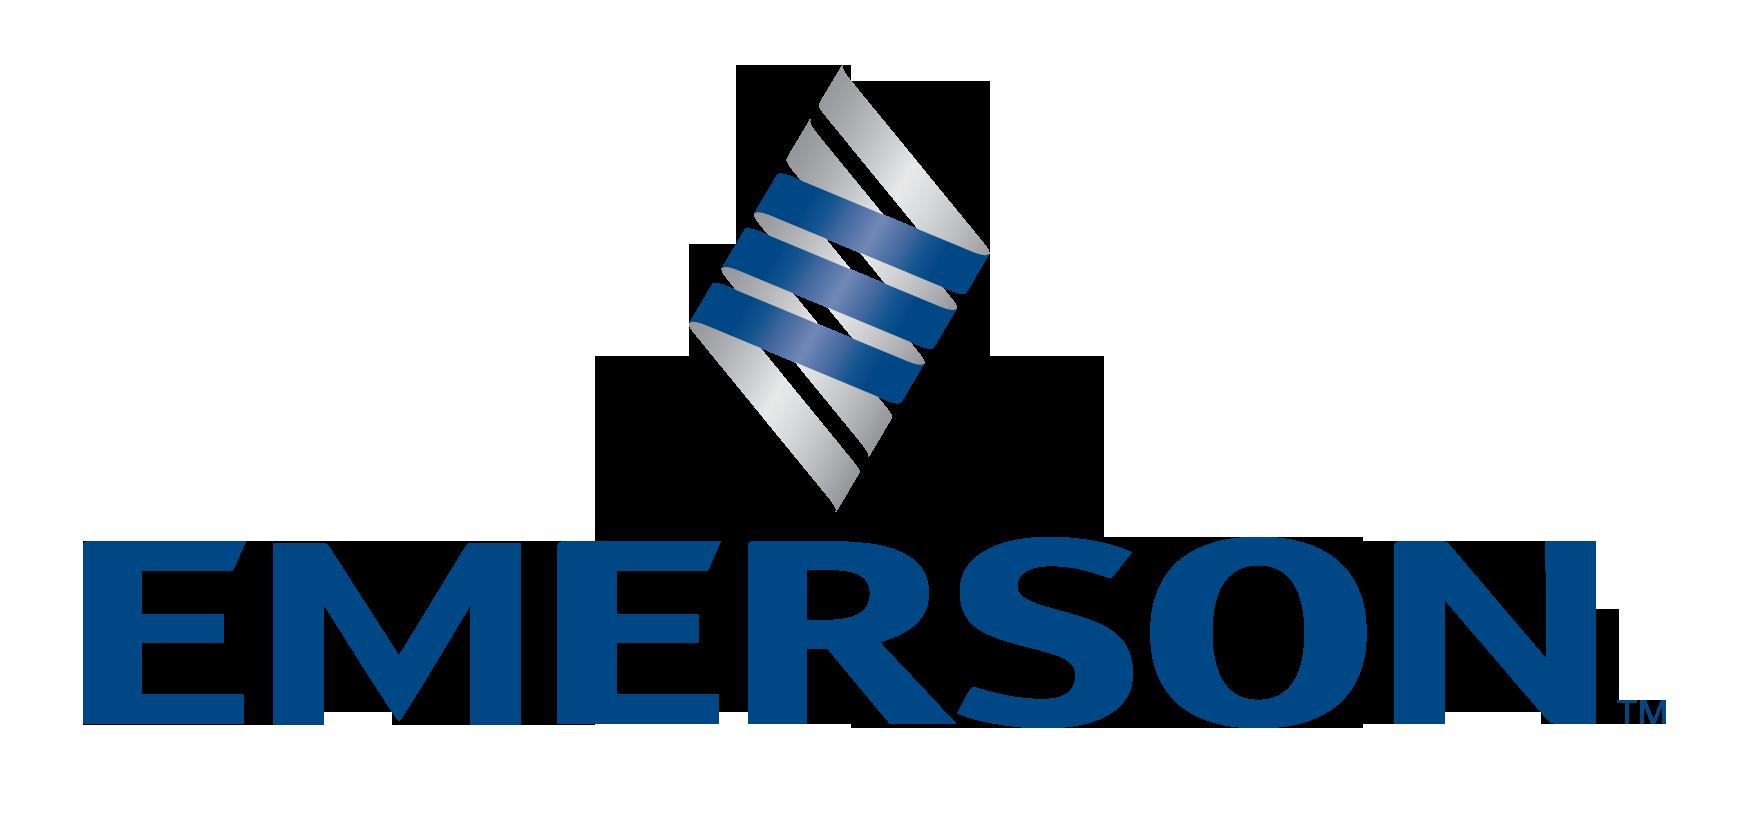 emerson electric logo png image purepng free